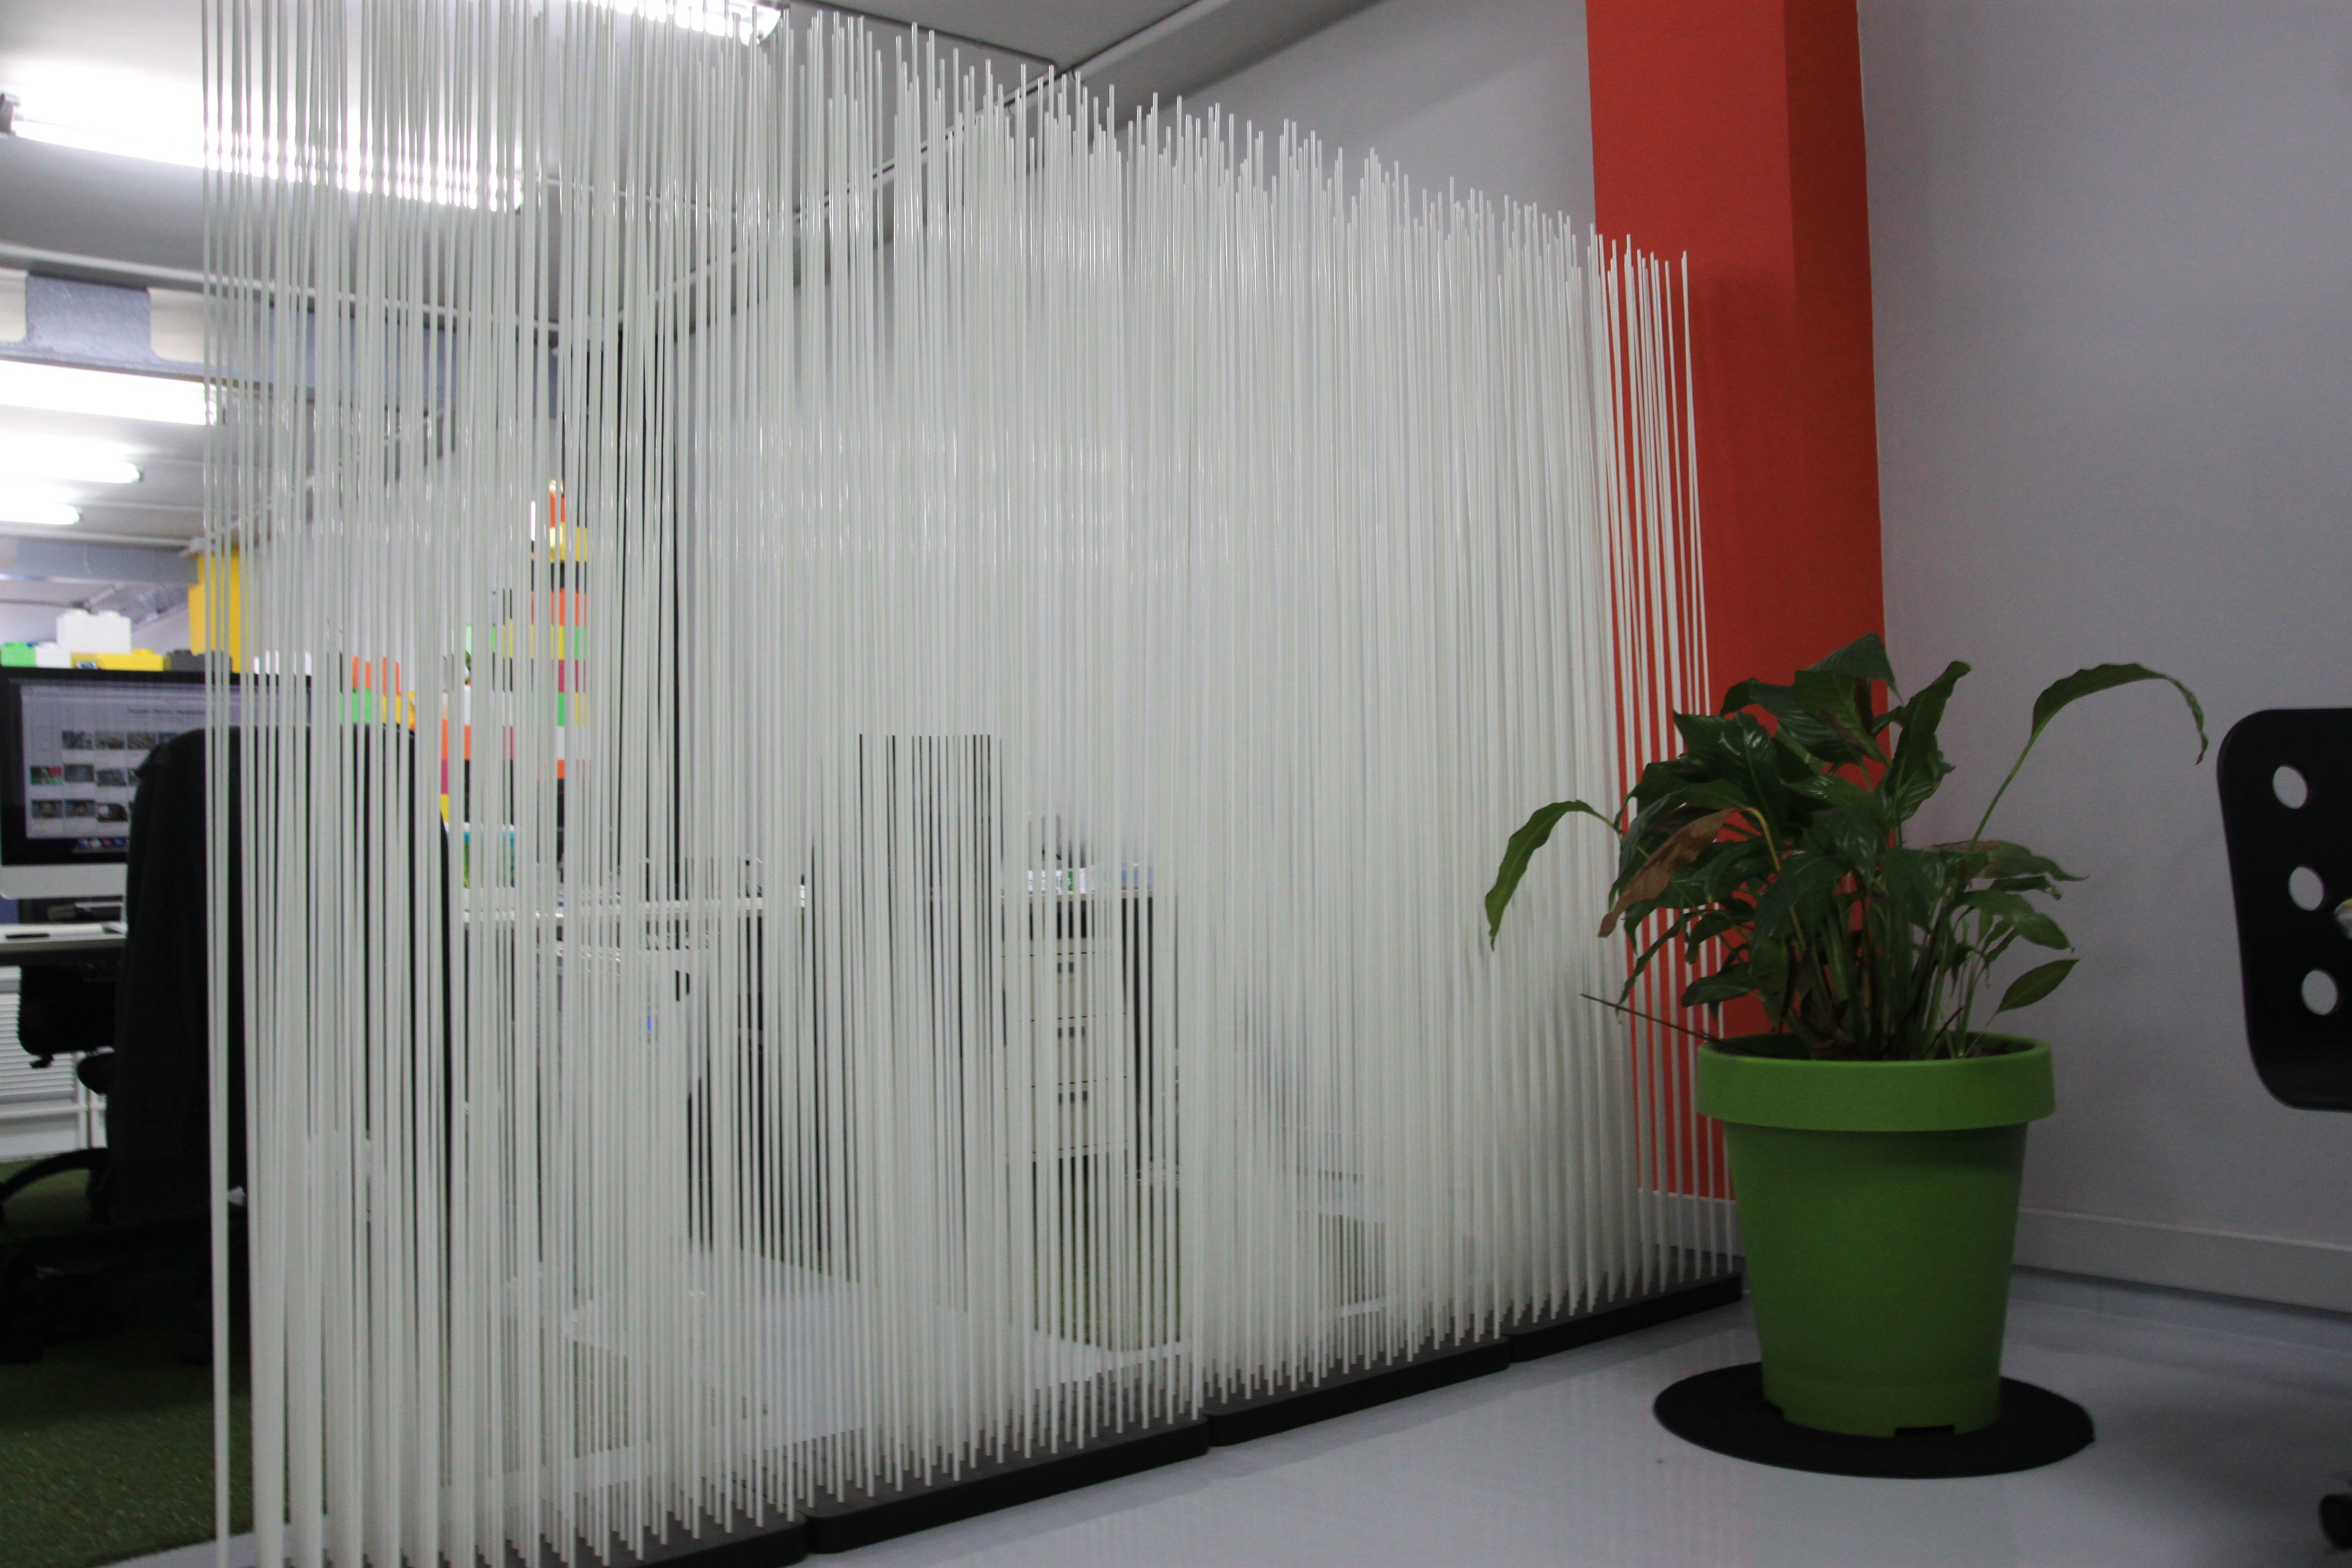 Separador de ambientes extremis excelenciaip nuestra - Separador de ambientes ...